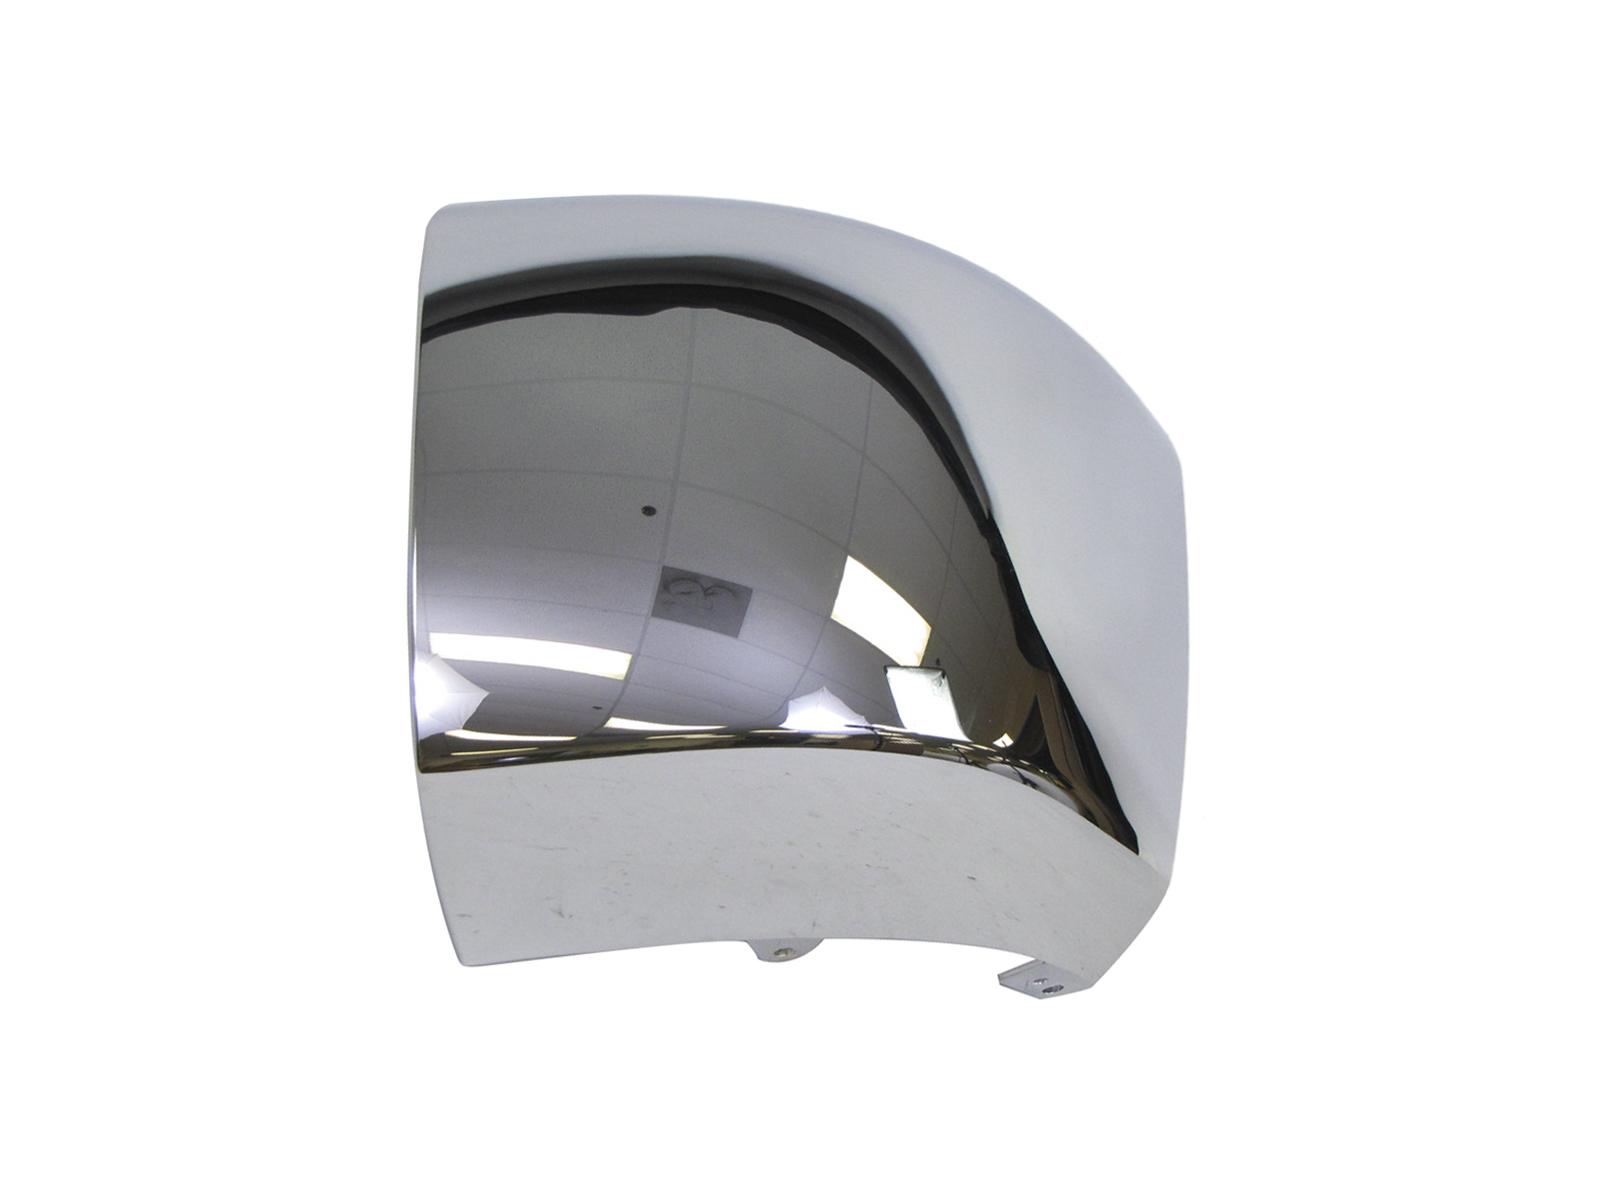 Rear Bumper Cap End Chrome LH For Chevy Silverado Gmc Sierra 2007-2013 W//O Hole